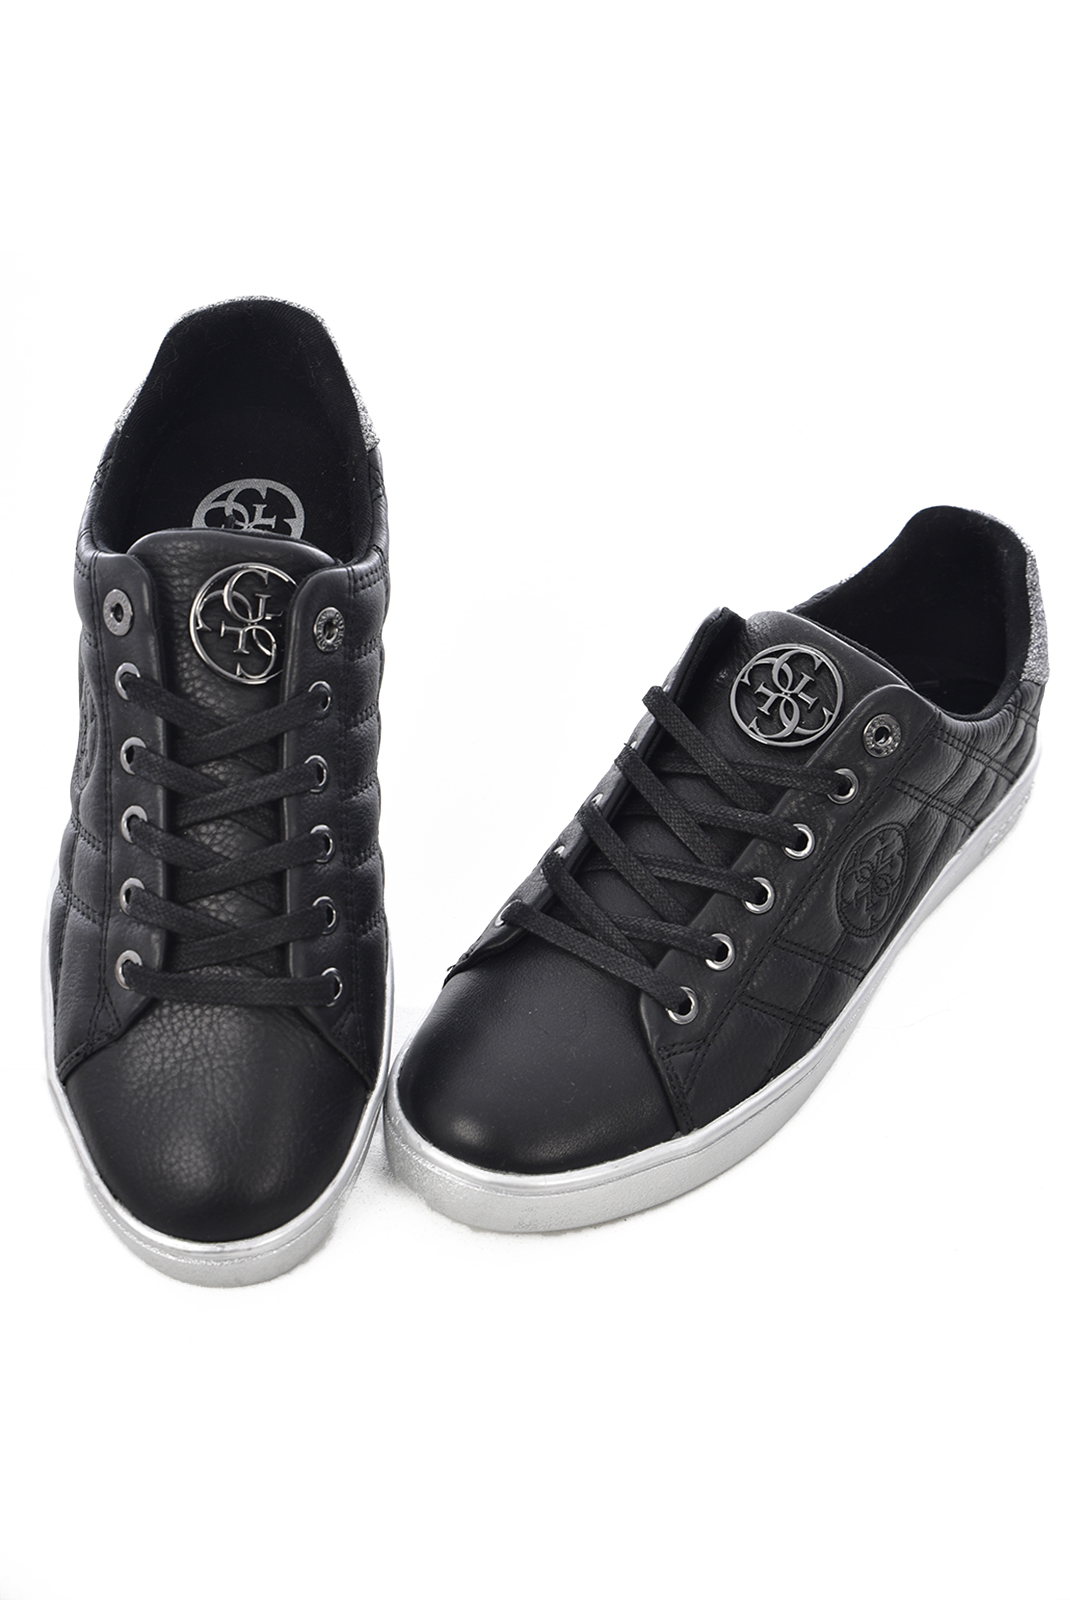 Baskets / Sneakers  Guess jeans FLBRZ4 LEA12 BLACK